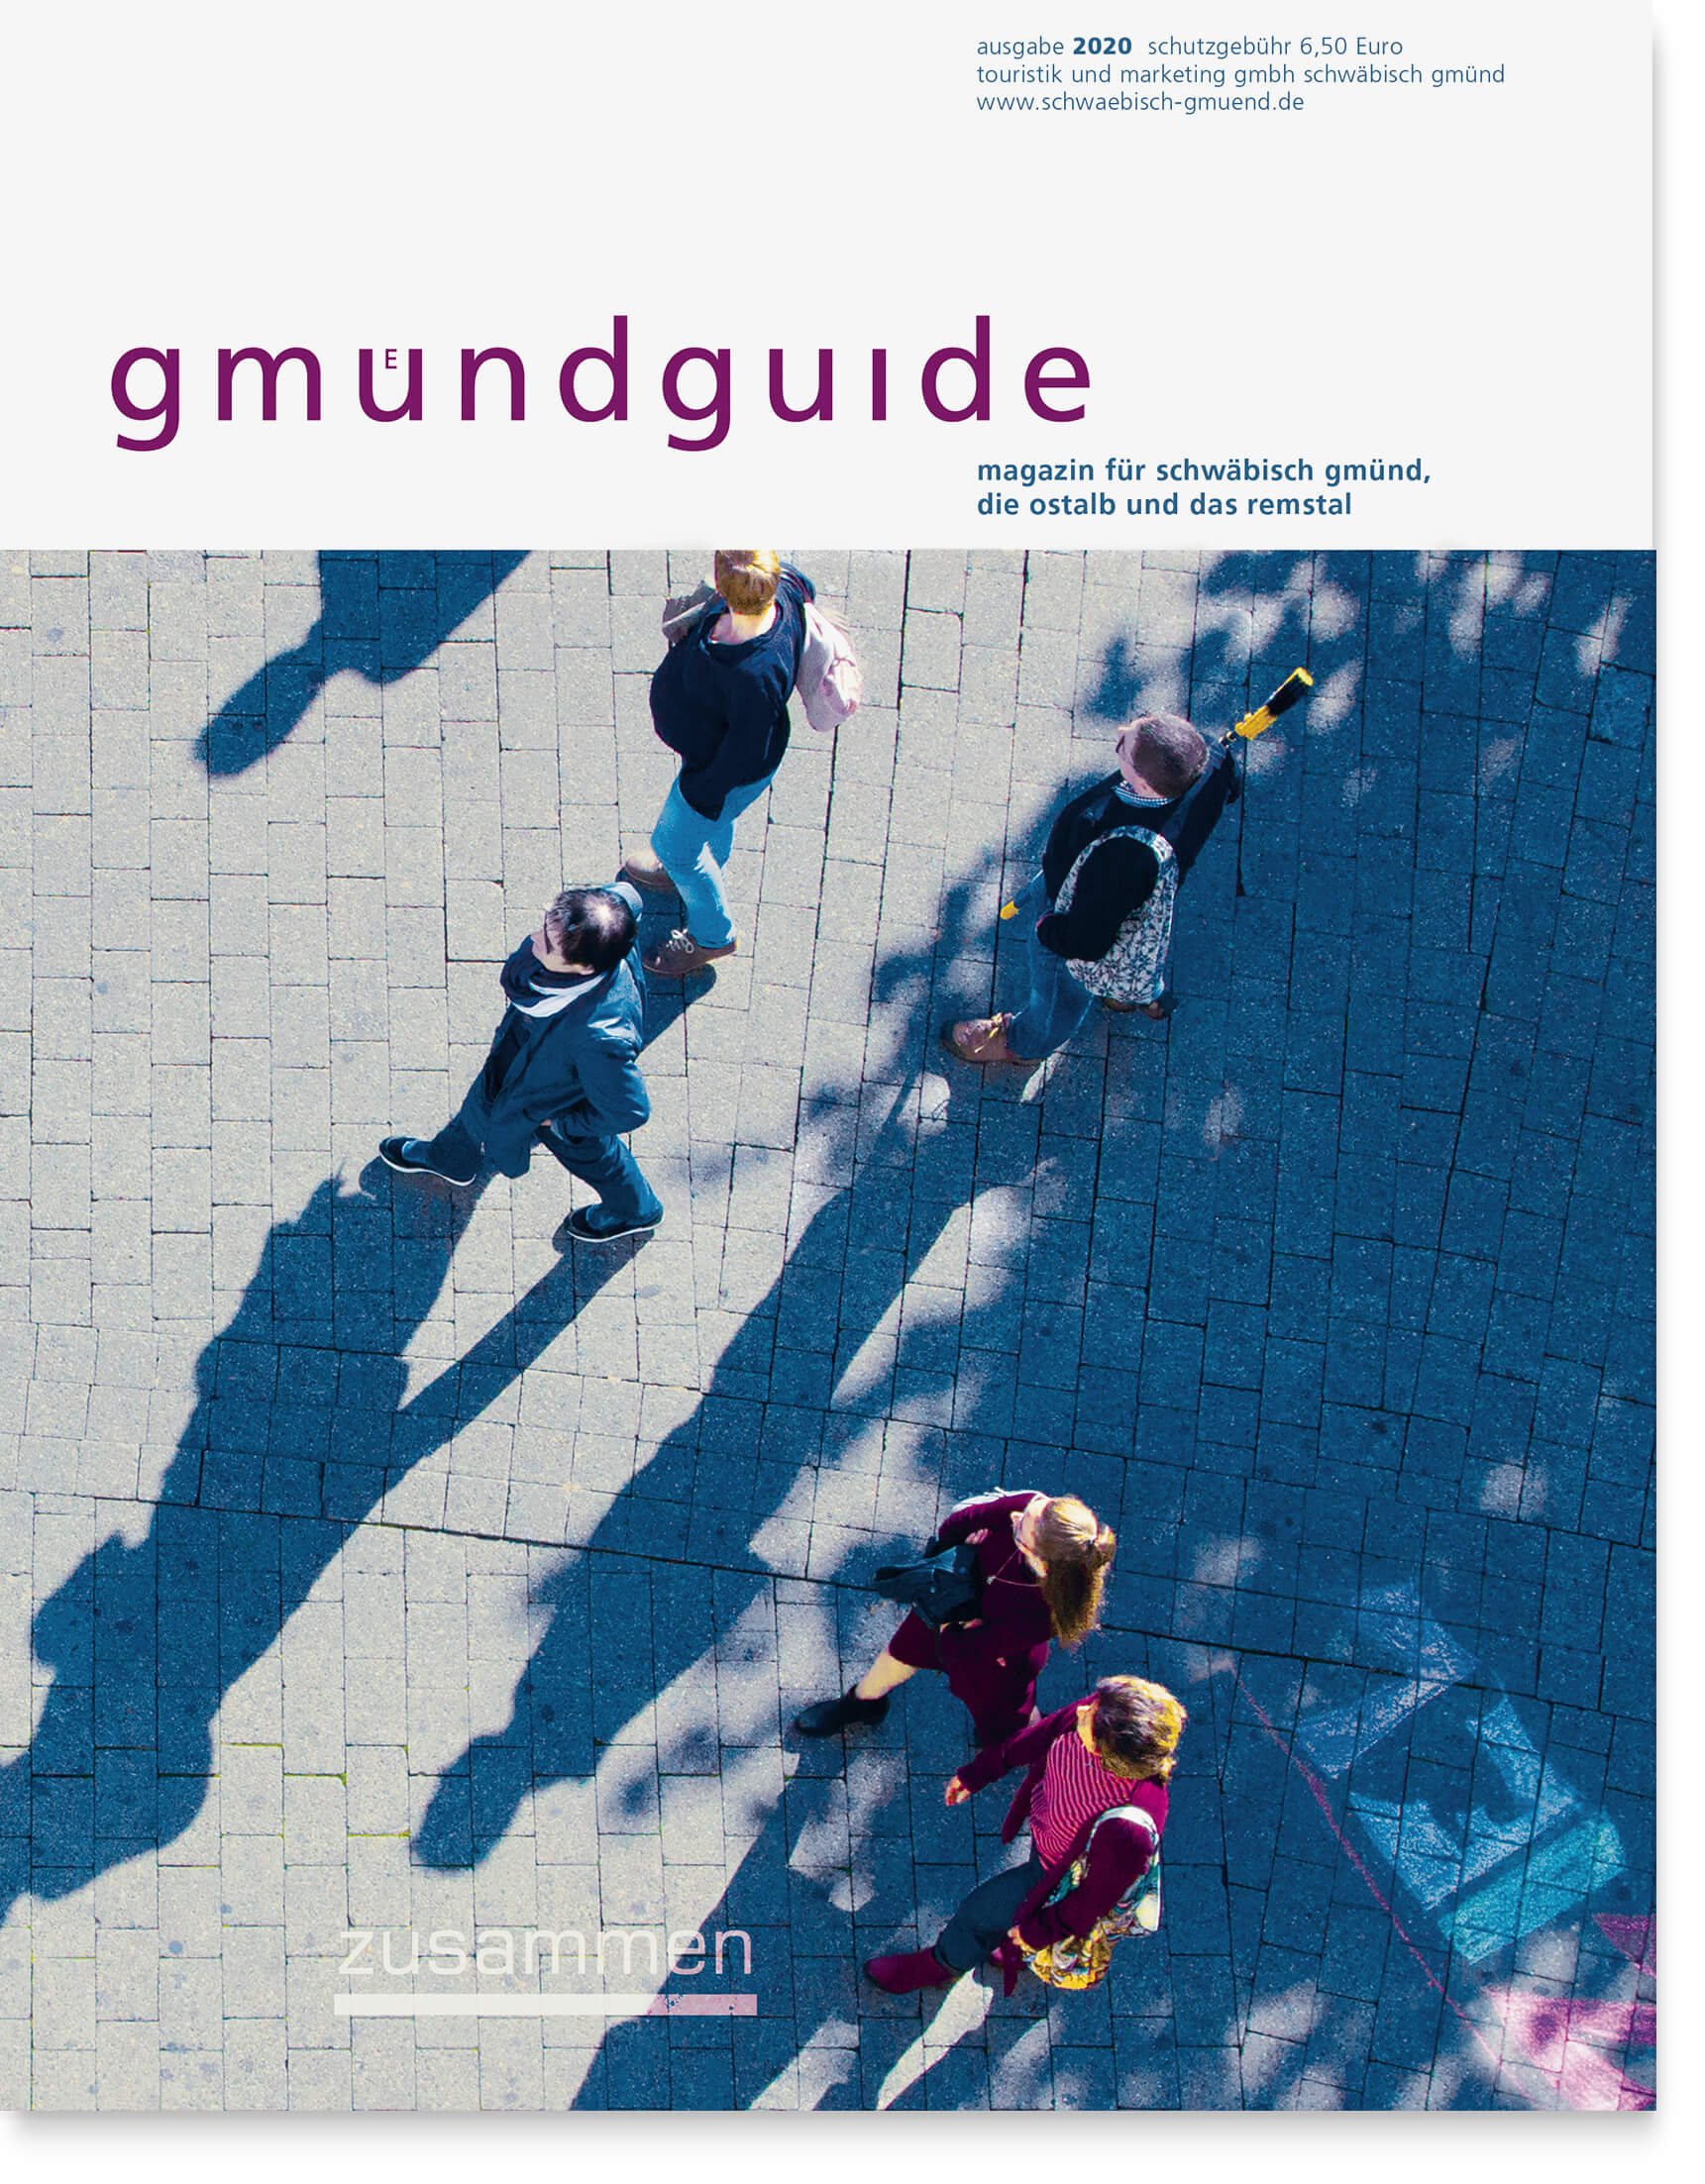 fh-web-gmuendguide-2020-1.jpg